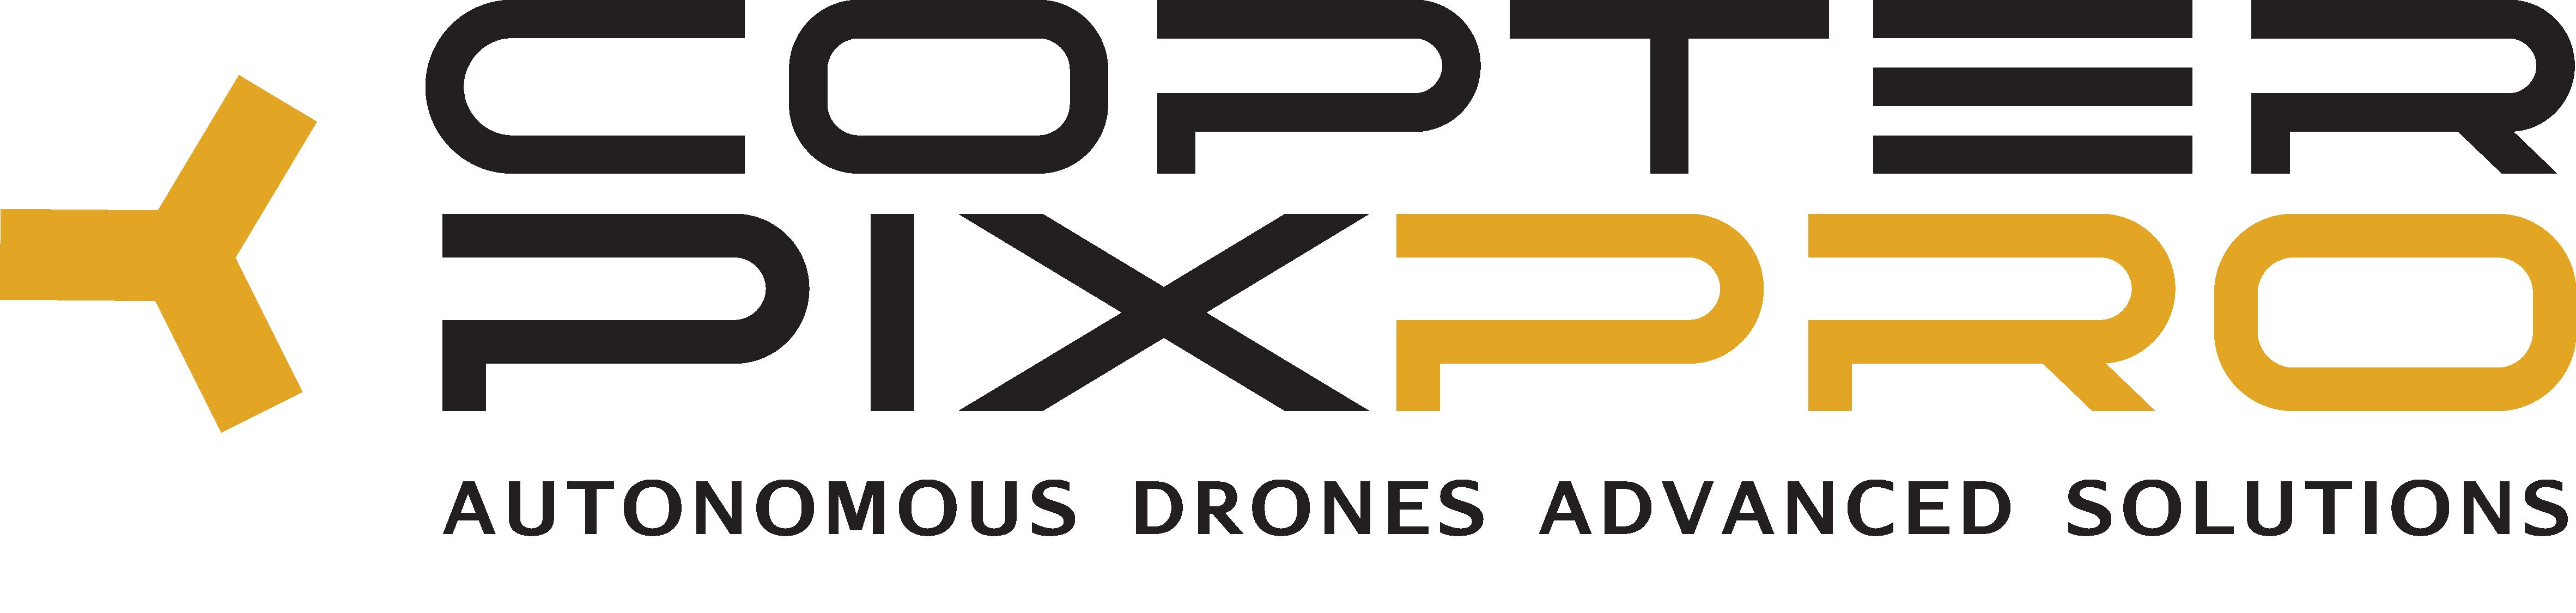 Anti Drone APAC